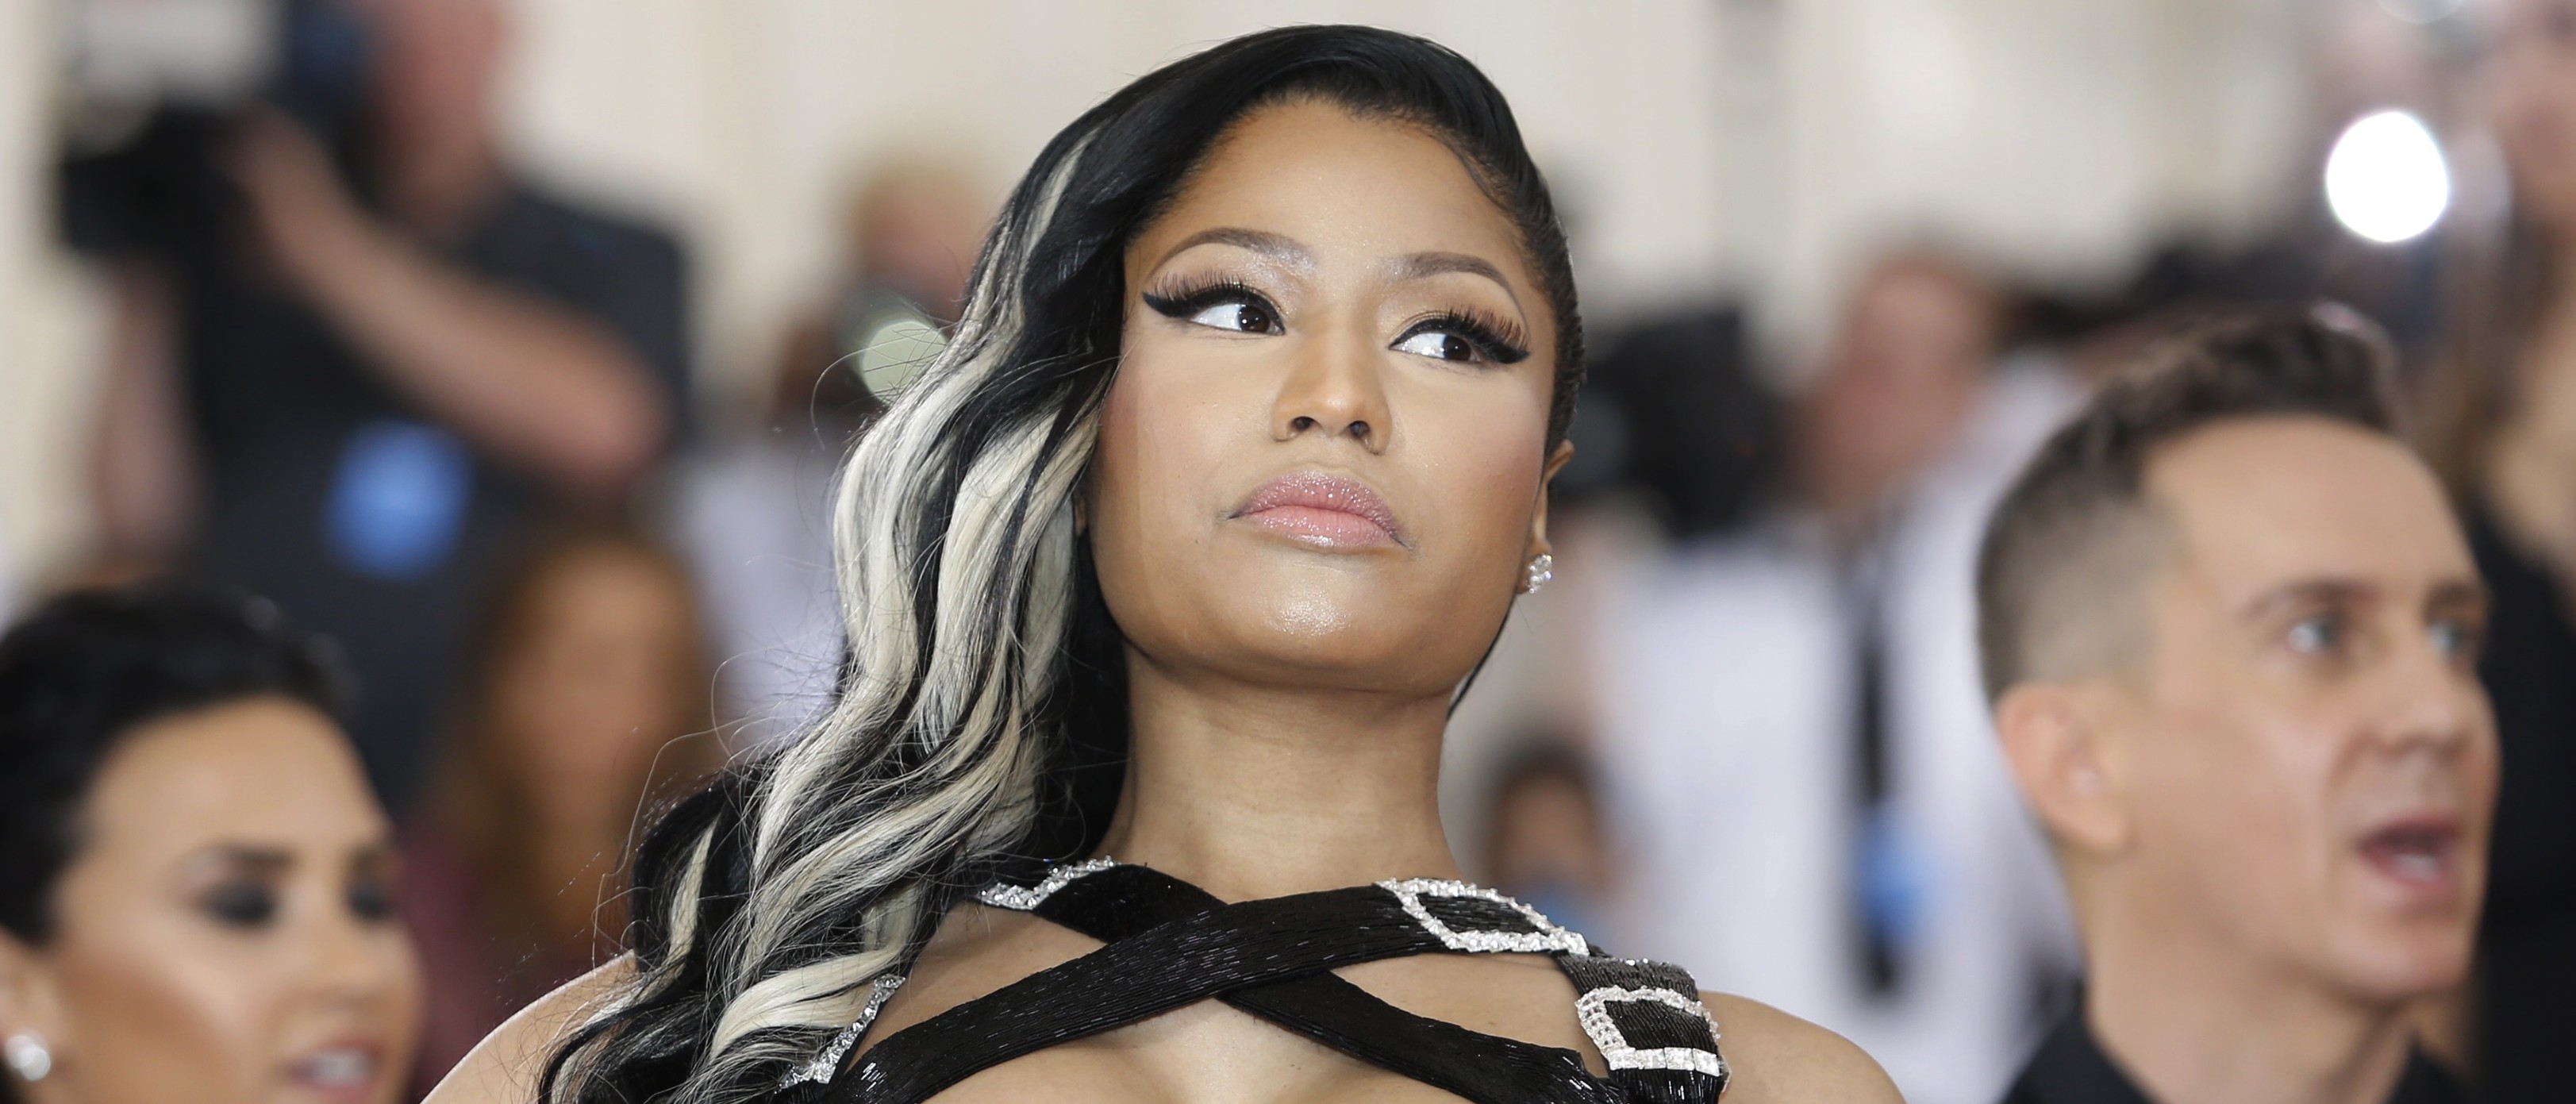 Rapper Nicki Minaj arrives at the Metropolitan Museum of Art Costume Institute Gala (Met Gala) to celebrate the opening of